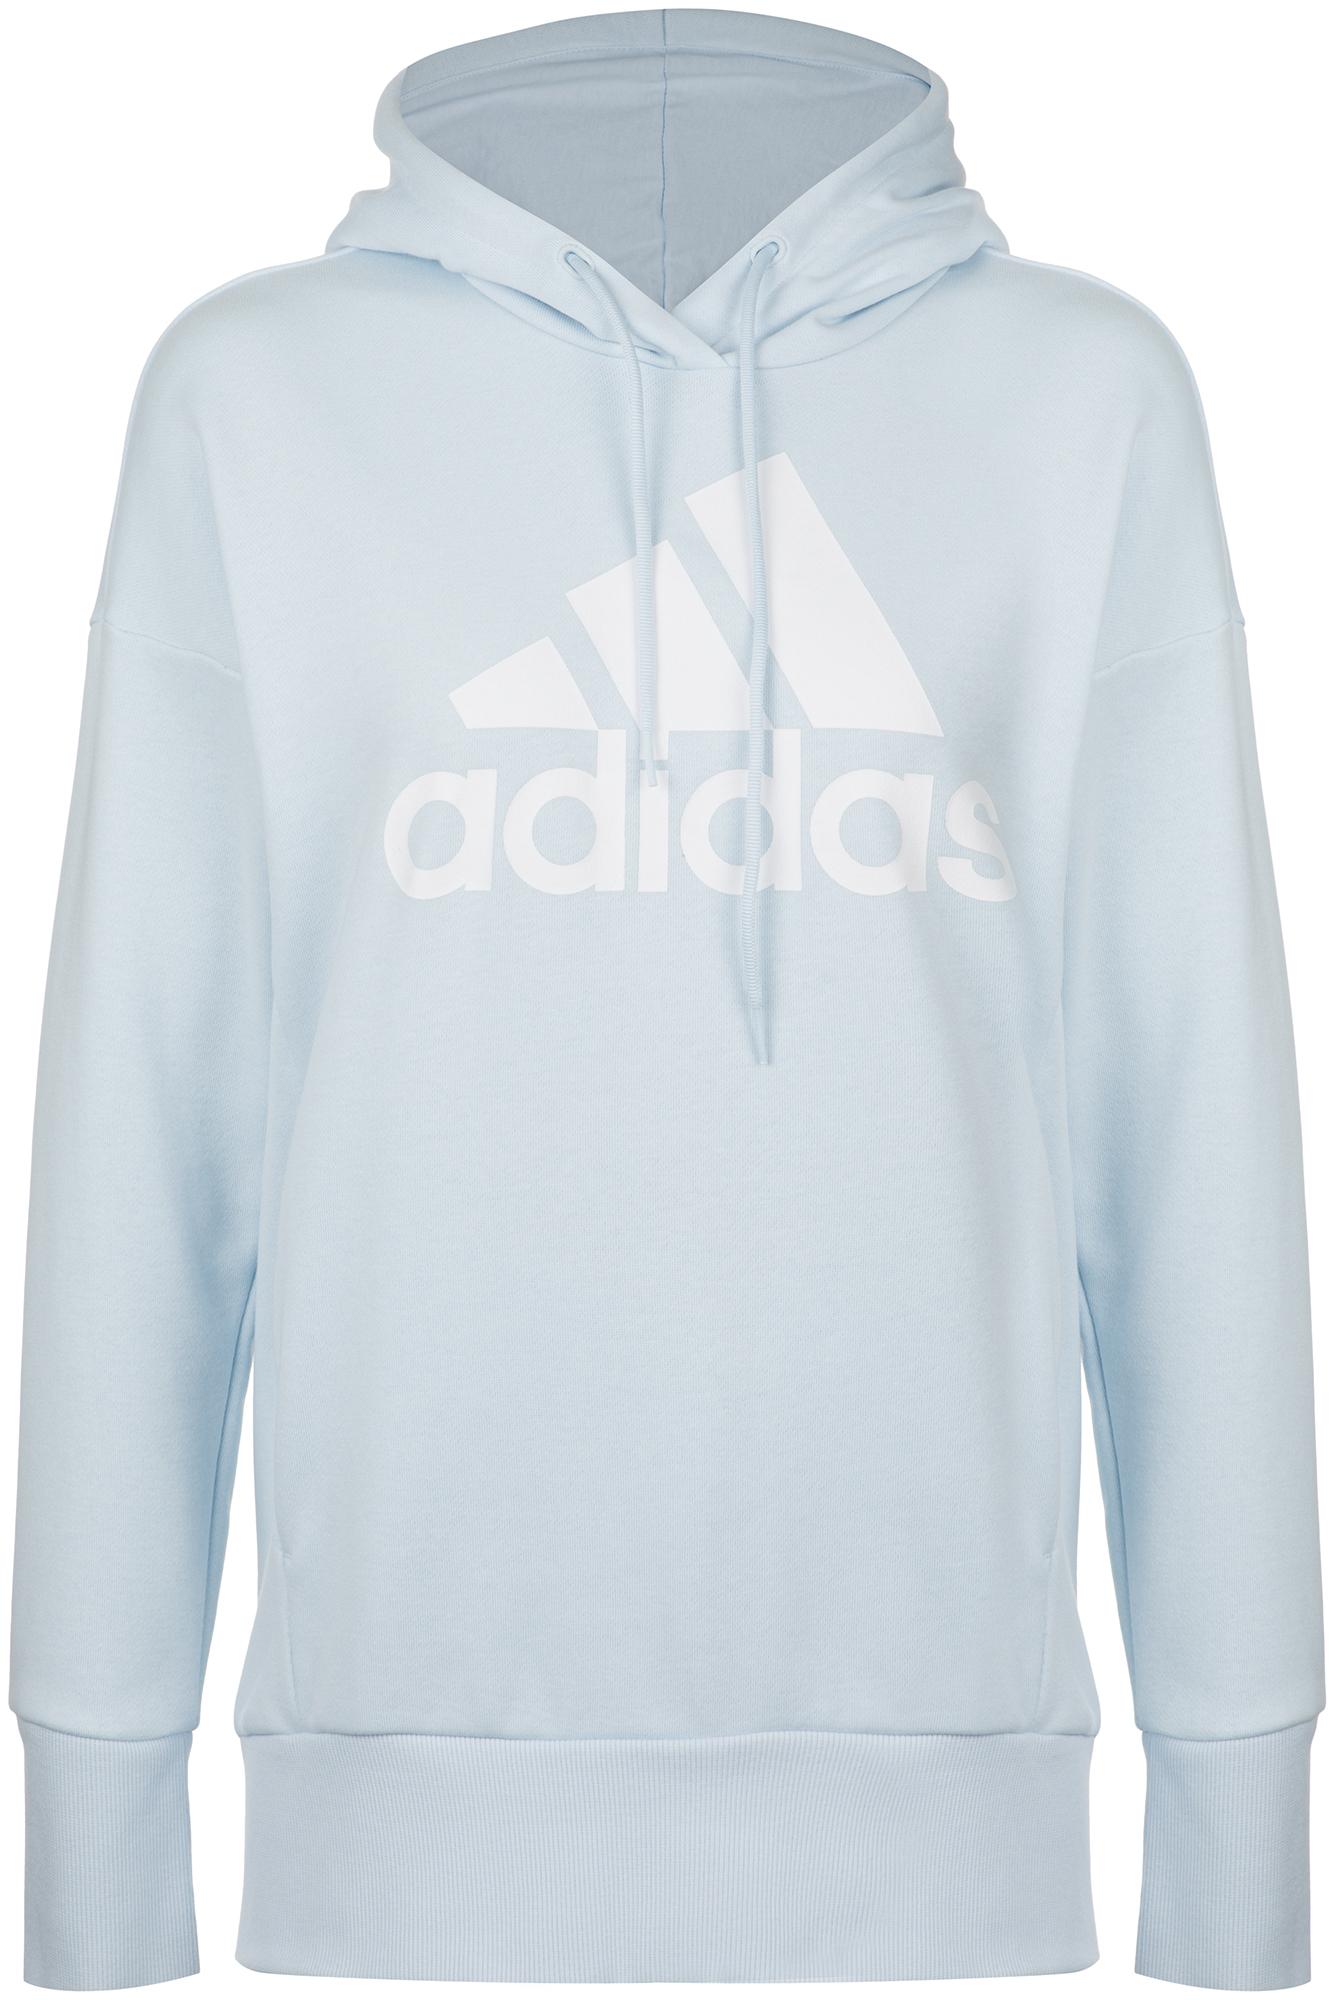 худи женское adidas ess 3s fz hd цвет серый розовый br2438 размер s 42 44 Adidas Худи женская adidas Badge of Sport, размер 38-40